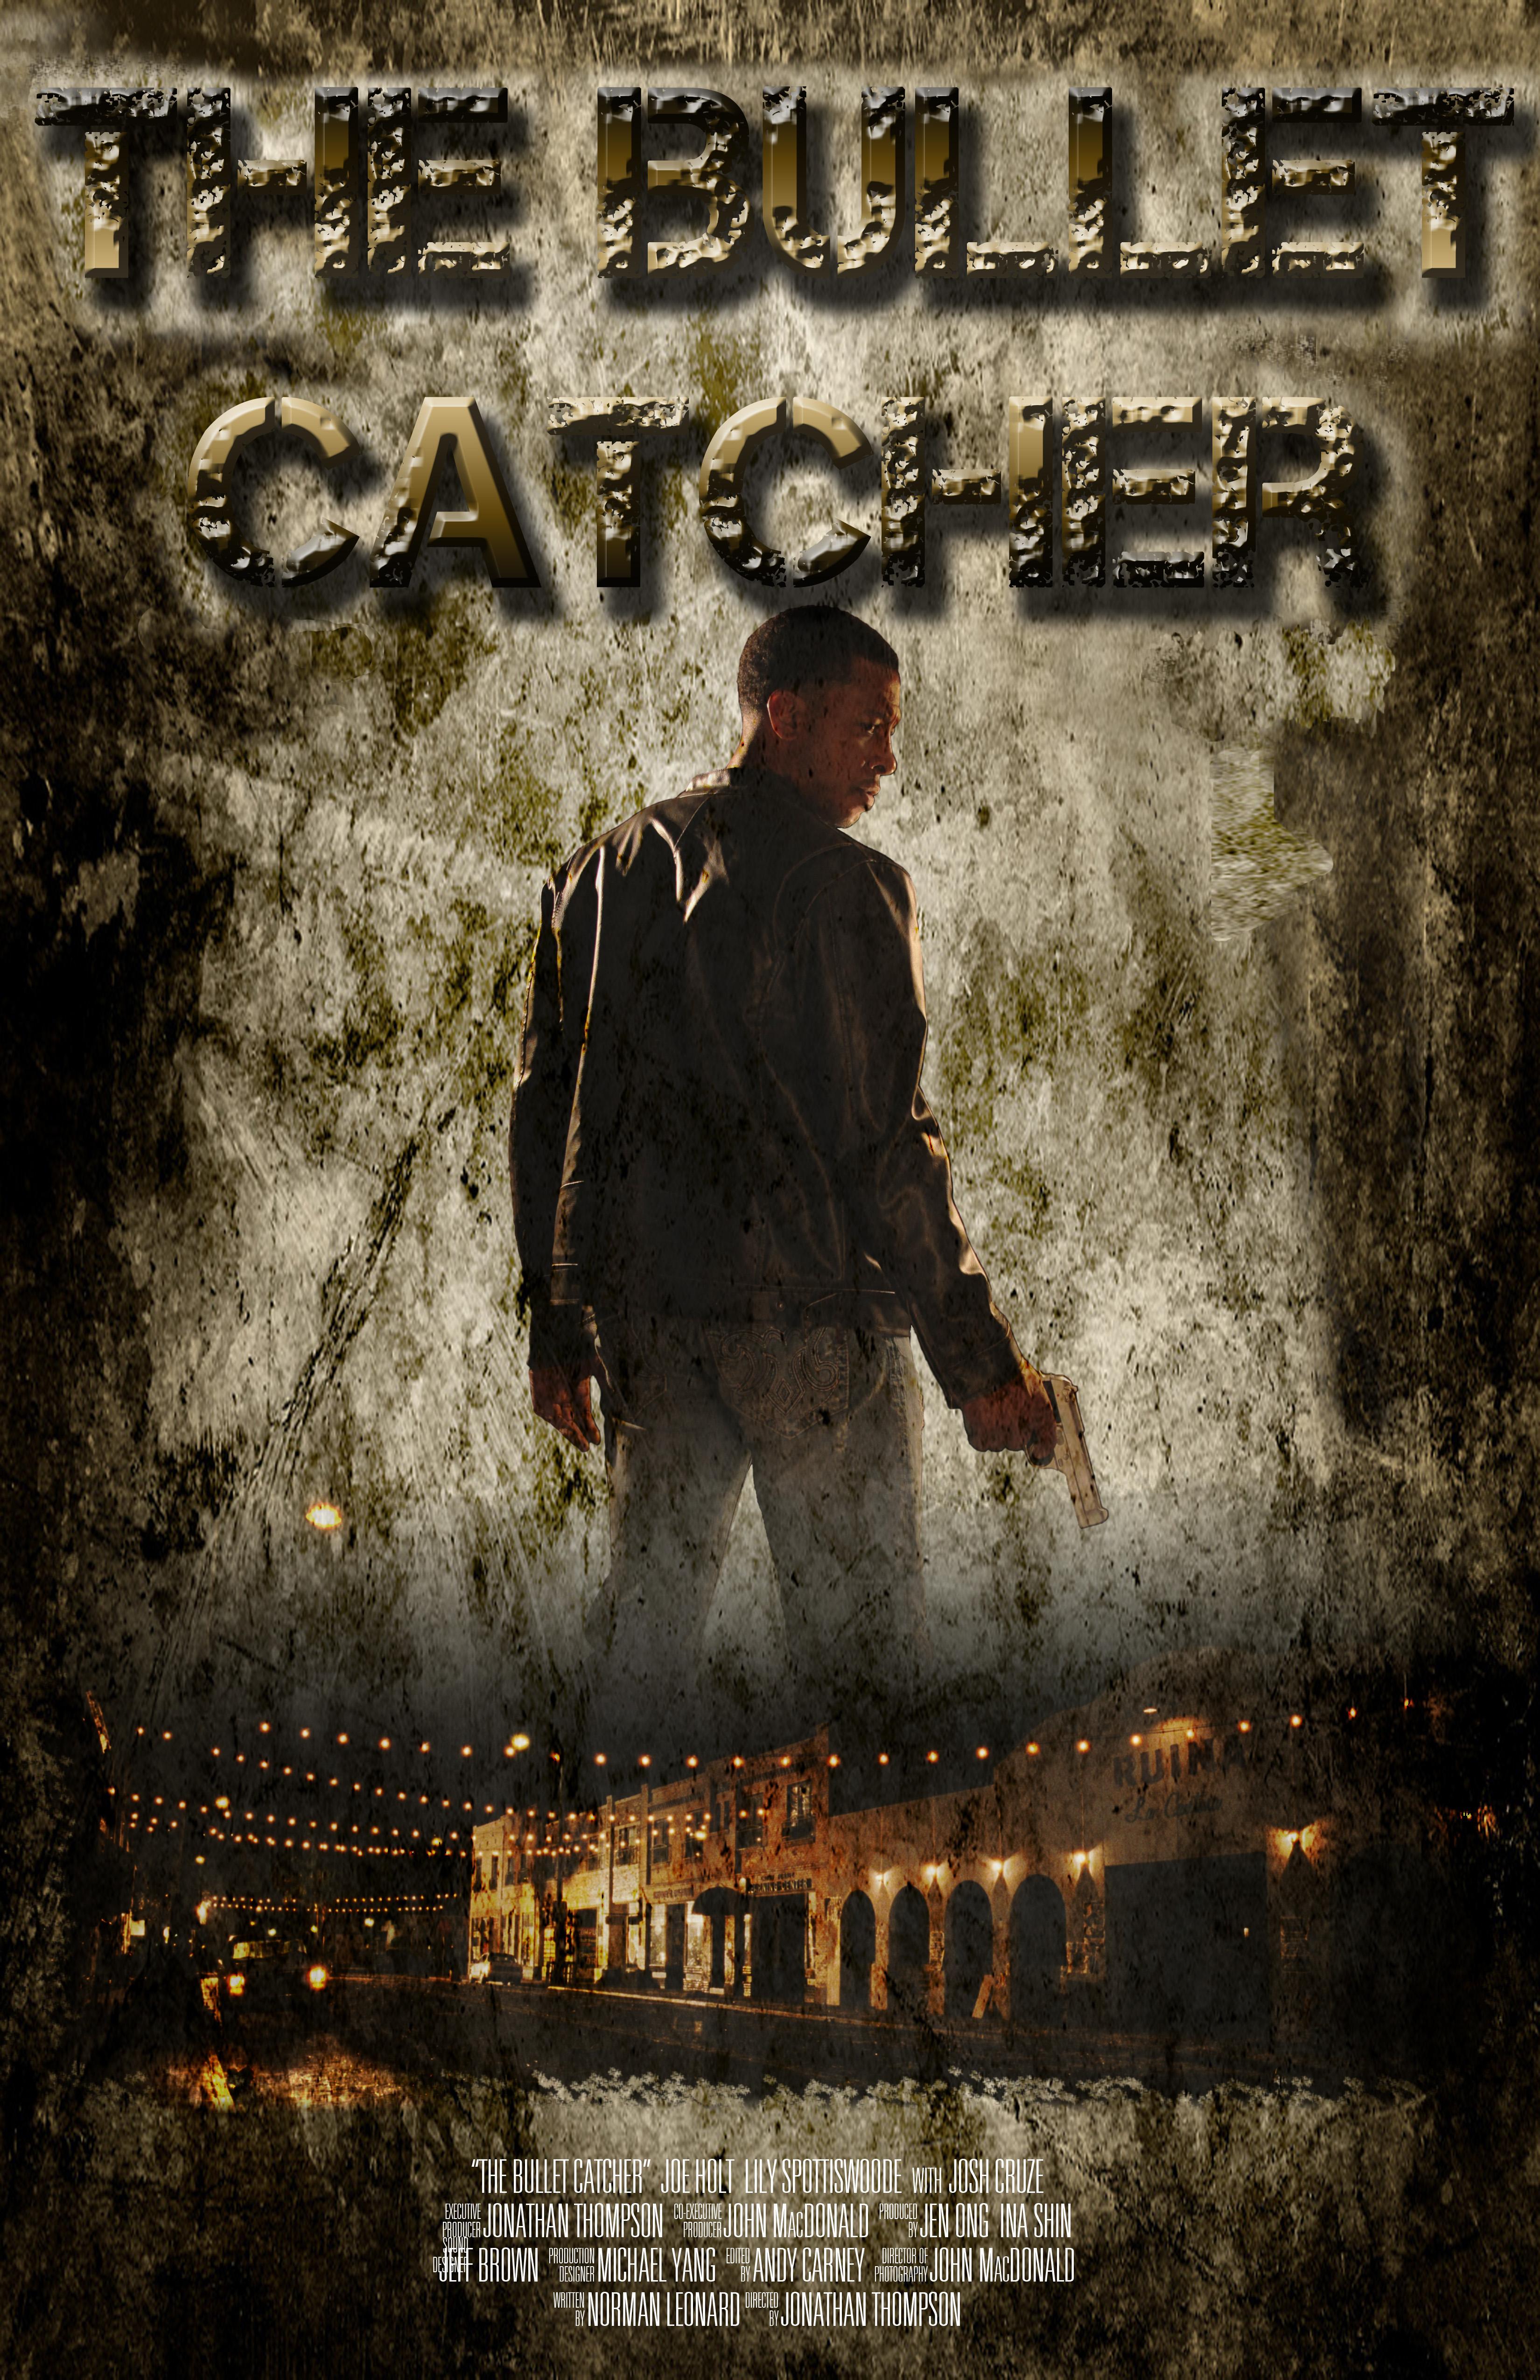 Bullet Catcher Poster